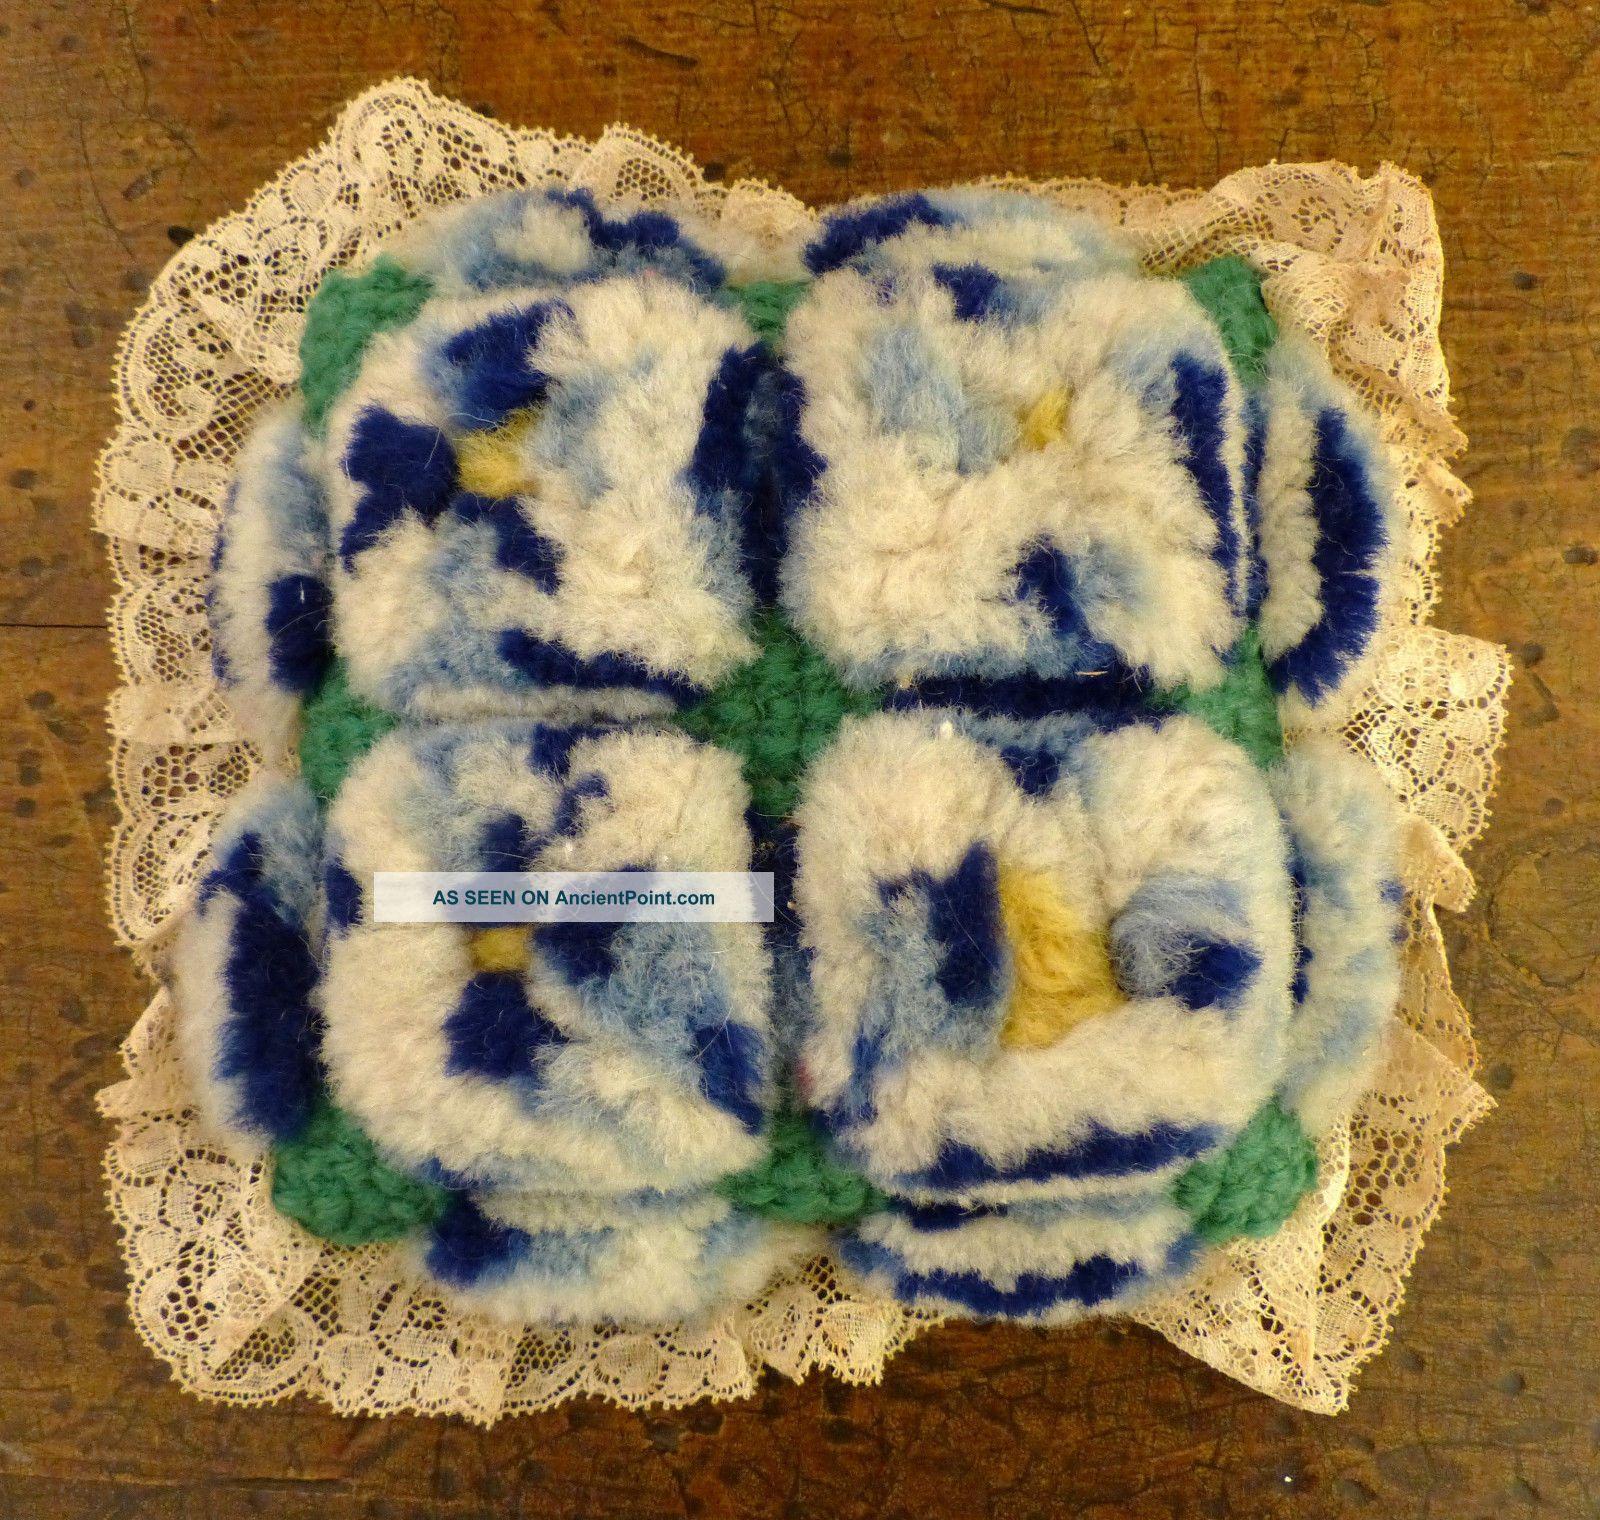 Antique Folk Art Mennonite Amish Sewing Velvet Stumpwork Pin Cushion 1 Pin Cushions photo